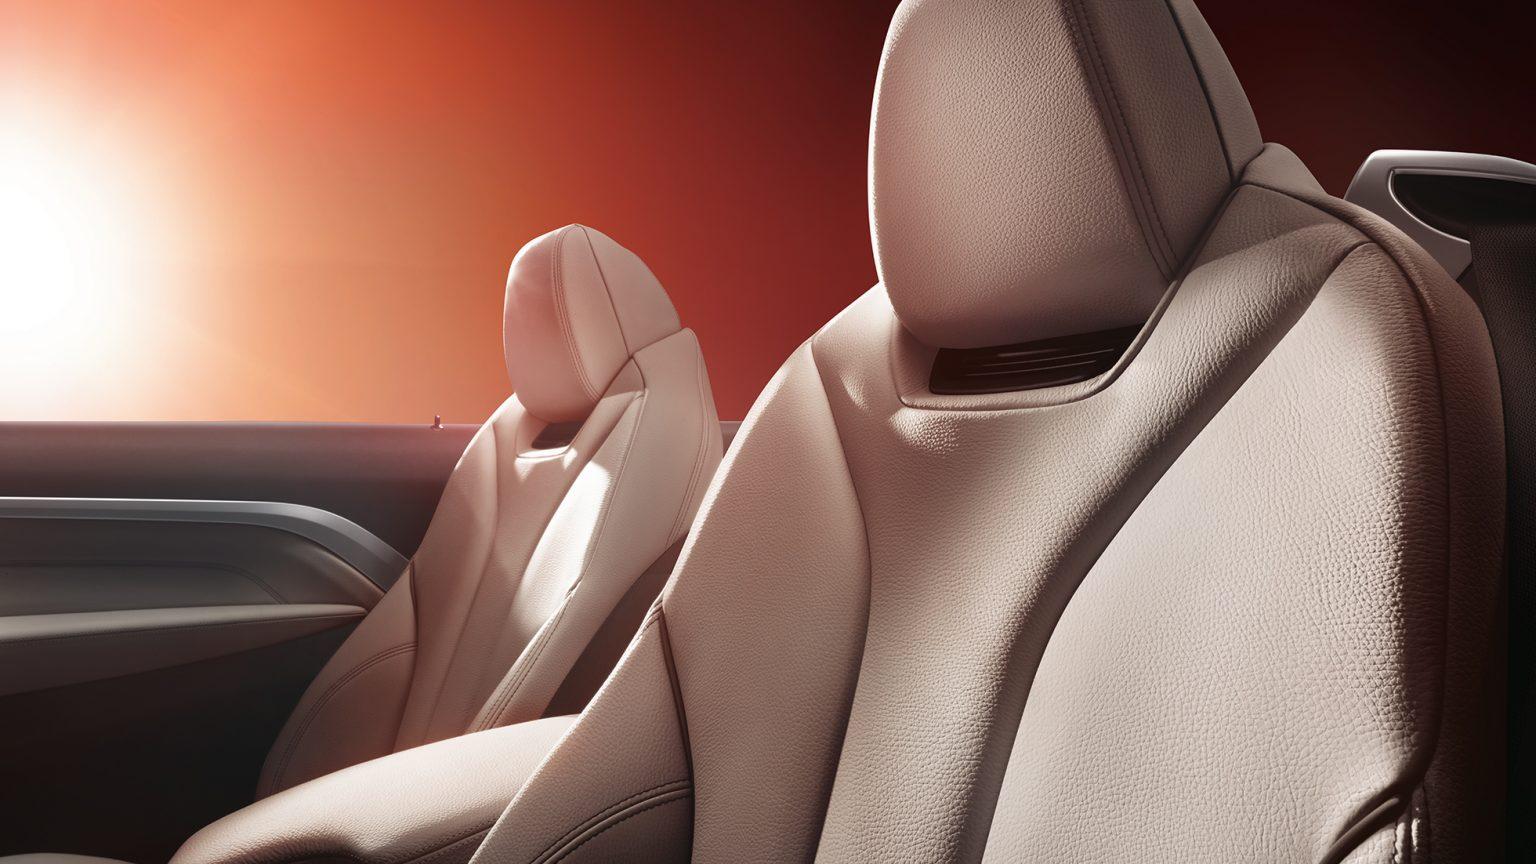 bmw-4-series-convertible-inspire-mg-exterior-interior-design-desktop-05